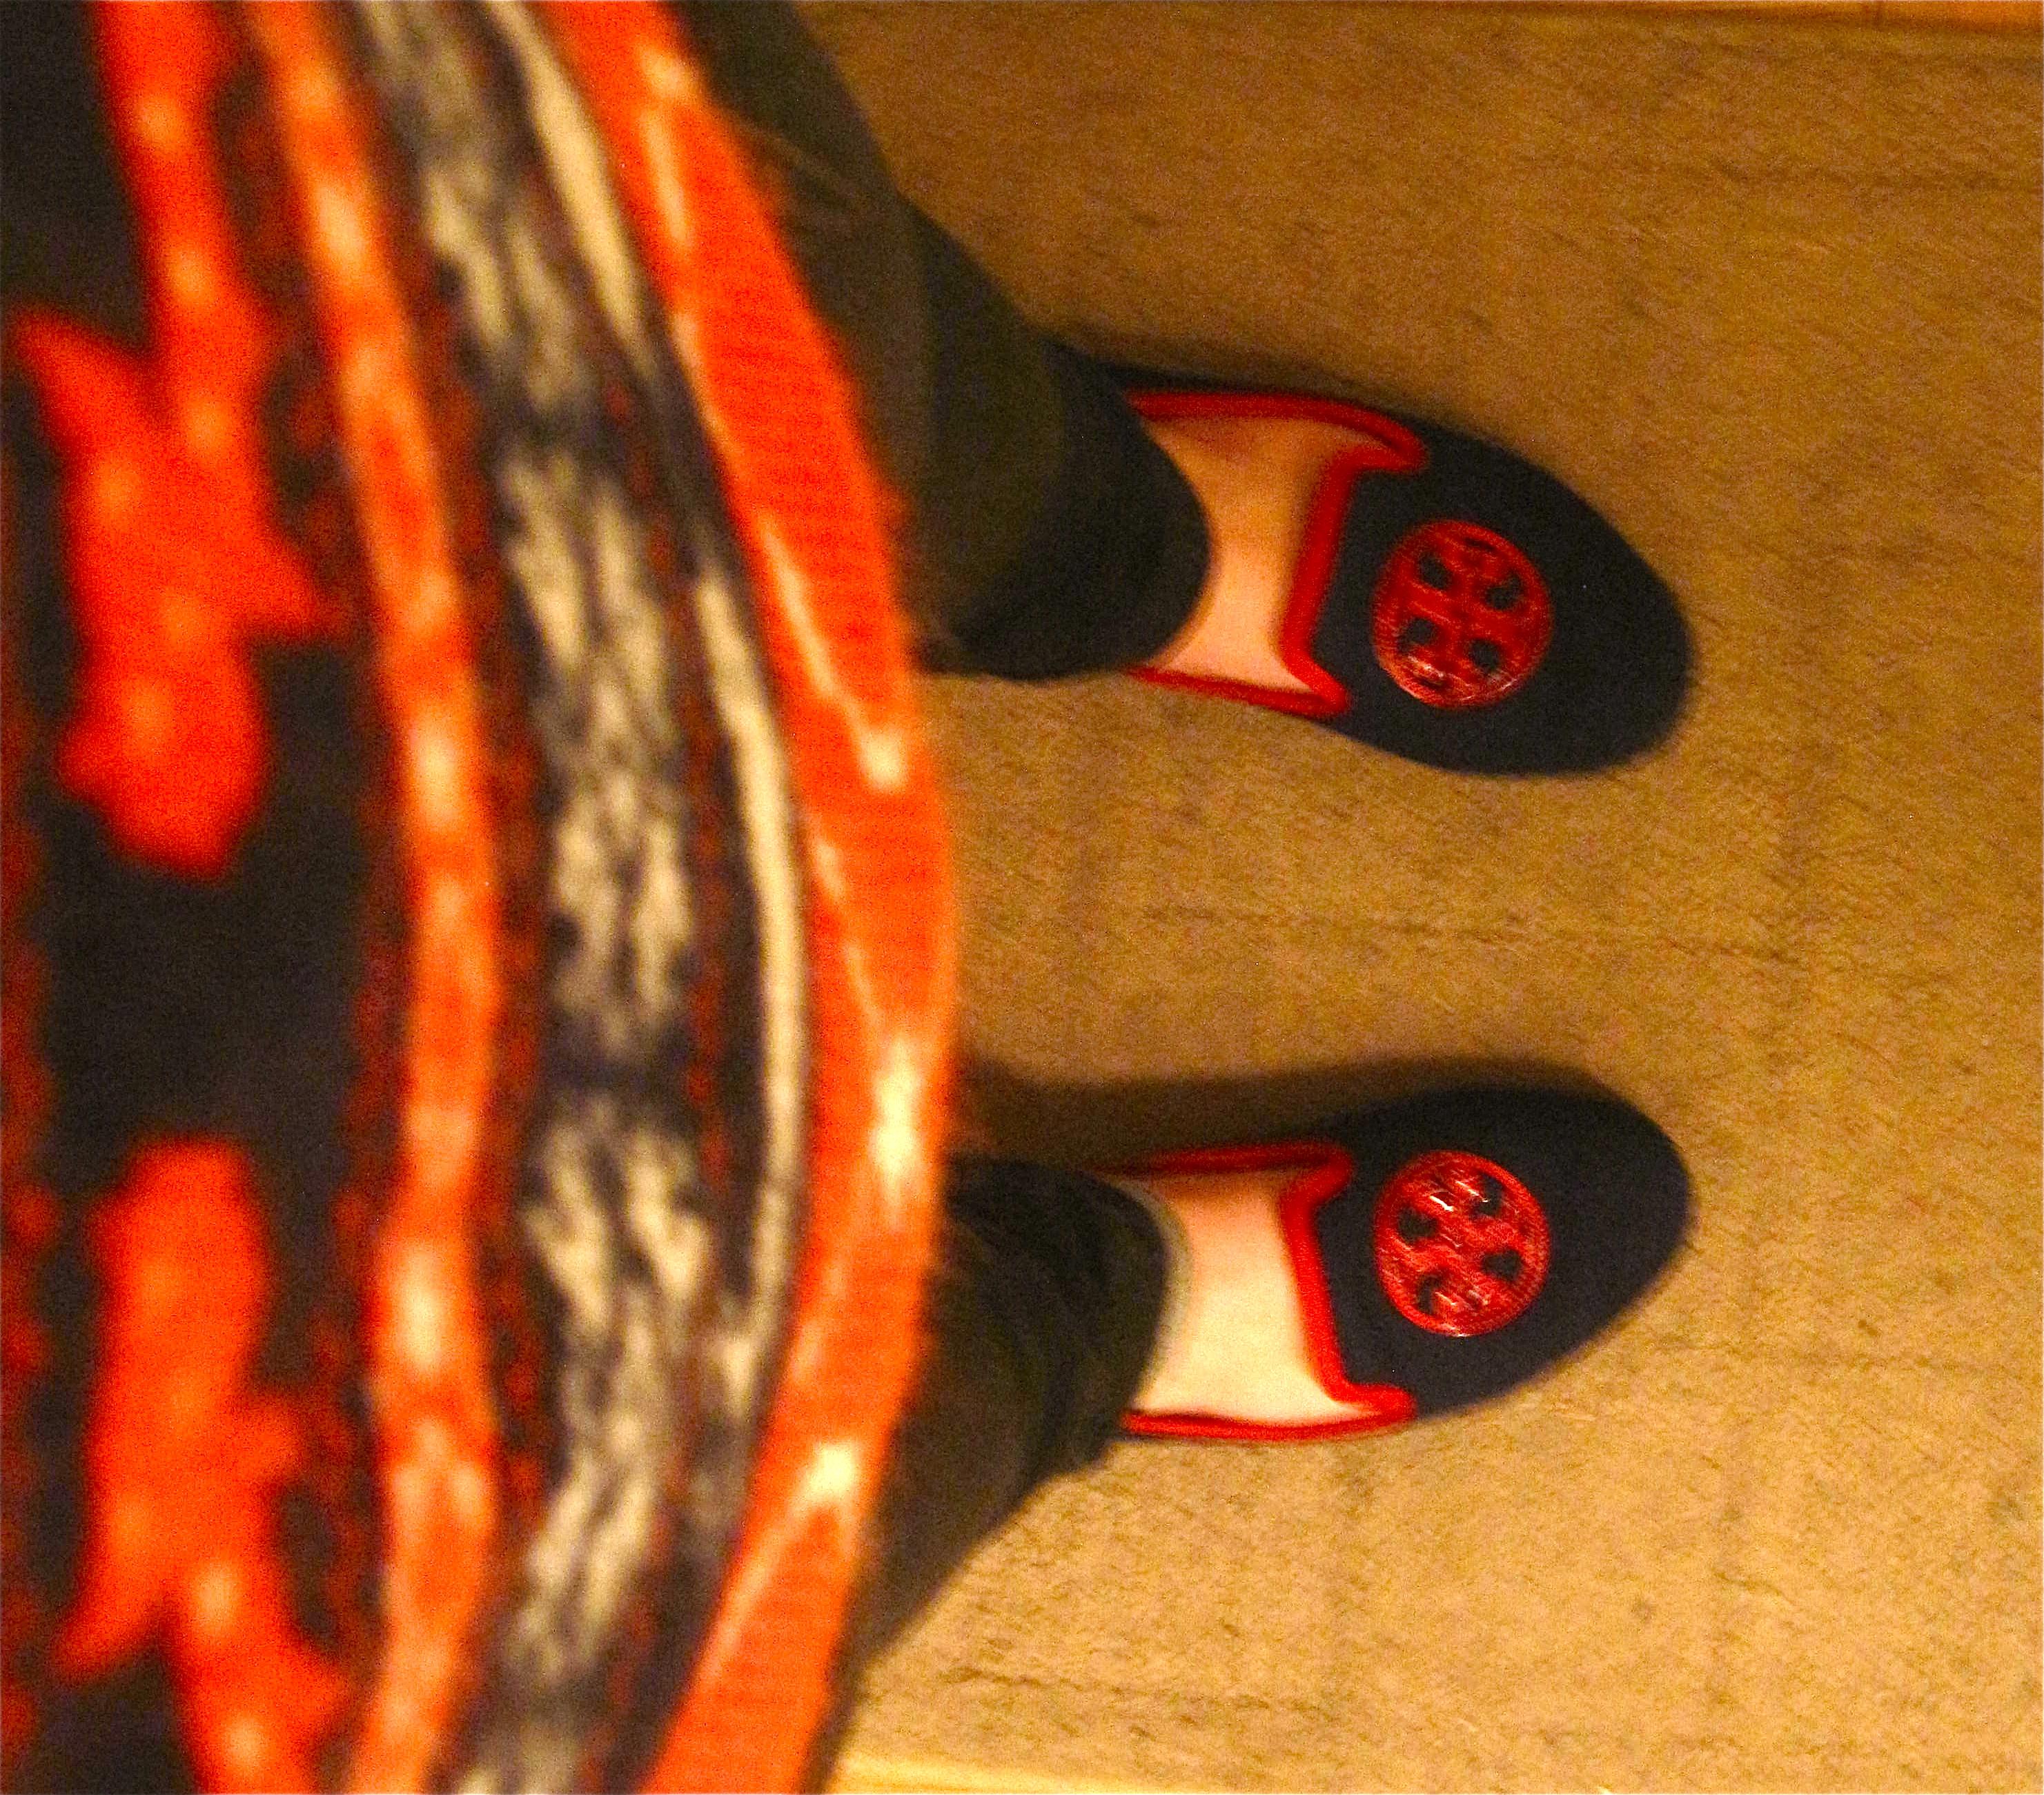 Fair Isle Sweater, J Crew. Black skinny jeans, Grane. Logo Slippers, Tory Burch, $57